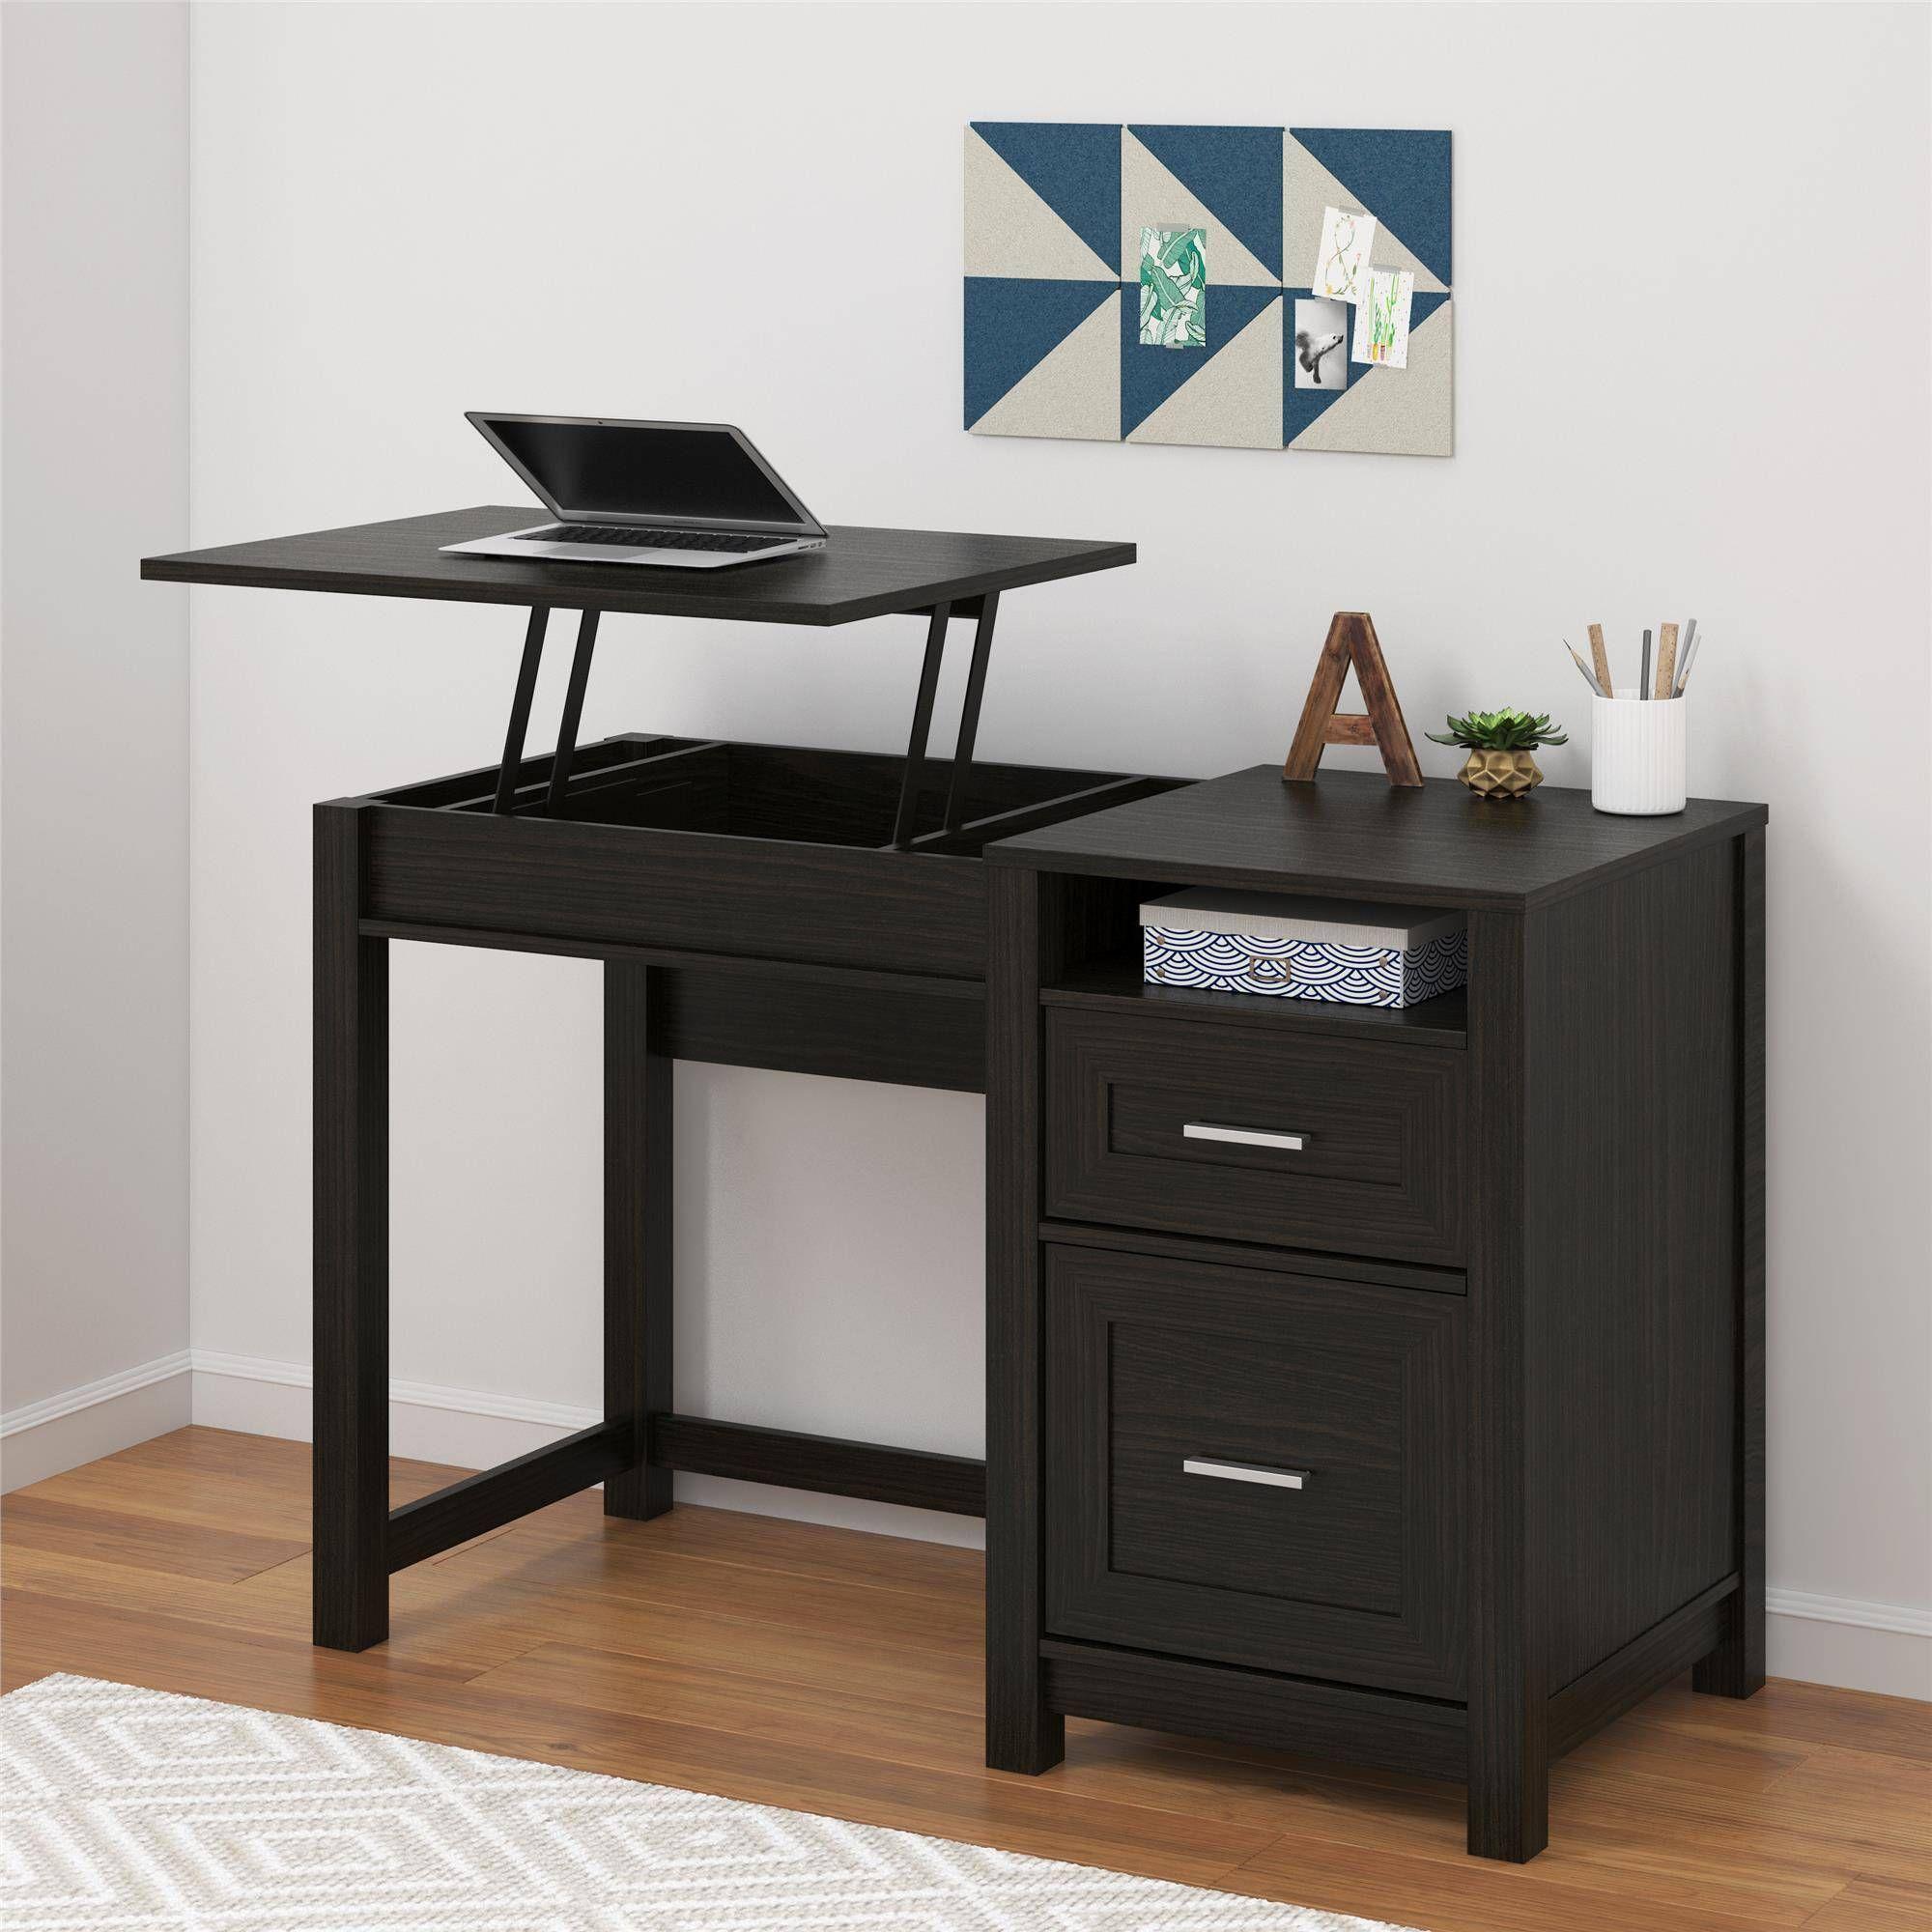 Amazon Com Bon Augure L Shaped Corner Desk Wood And Metal Computer Desk With Storage Shelf In Metal Office Desk L Shaped Corner Desk Office Furniture Design